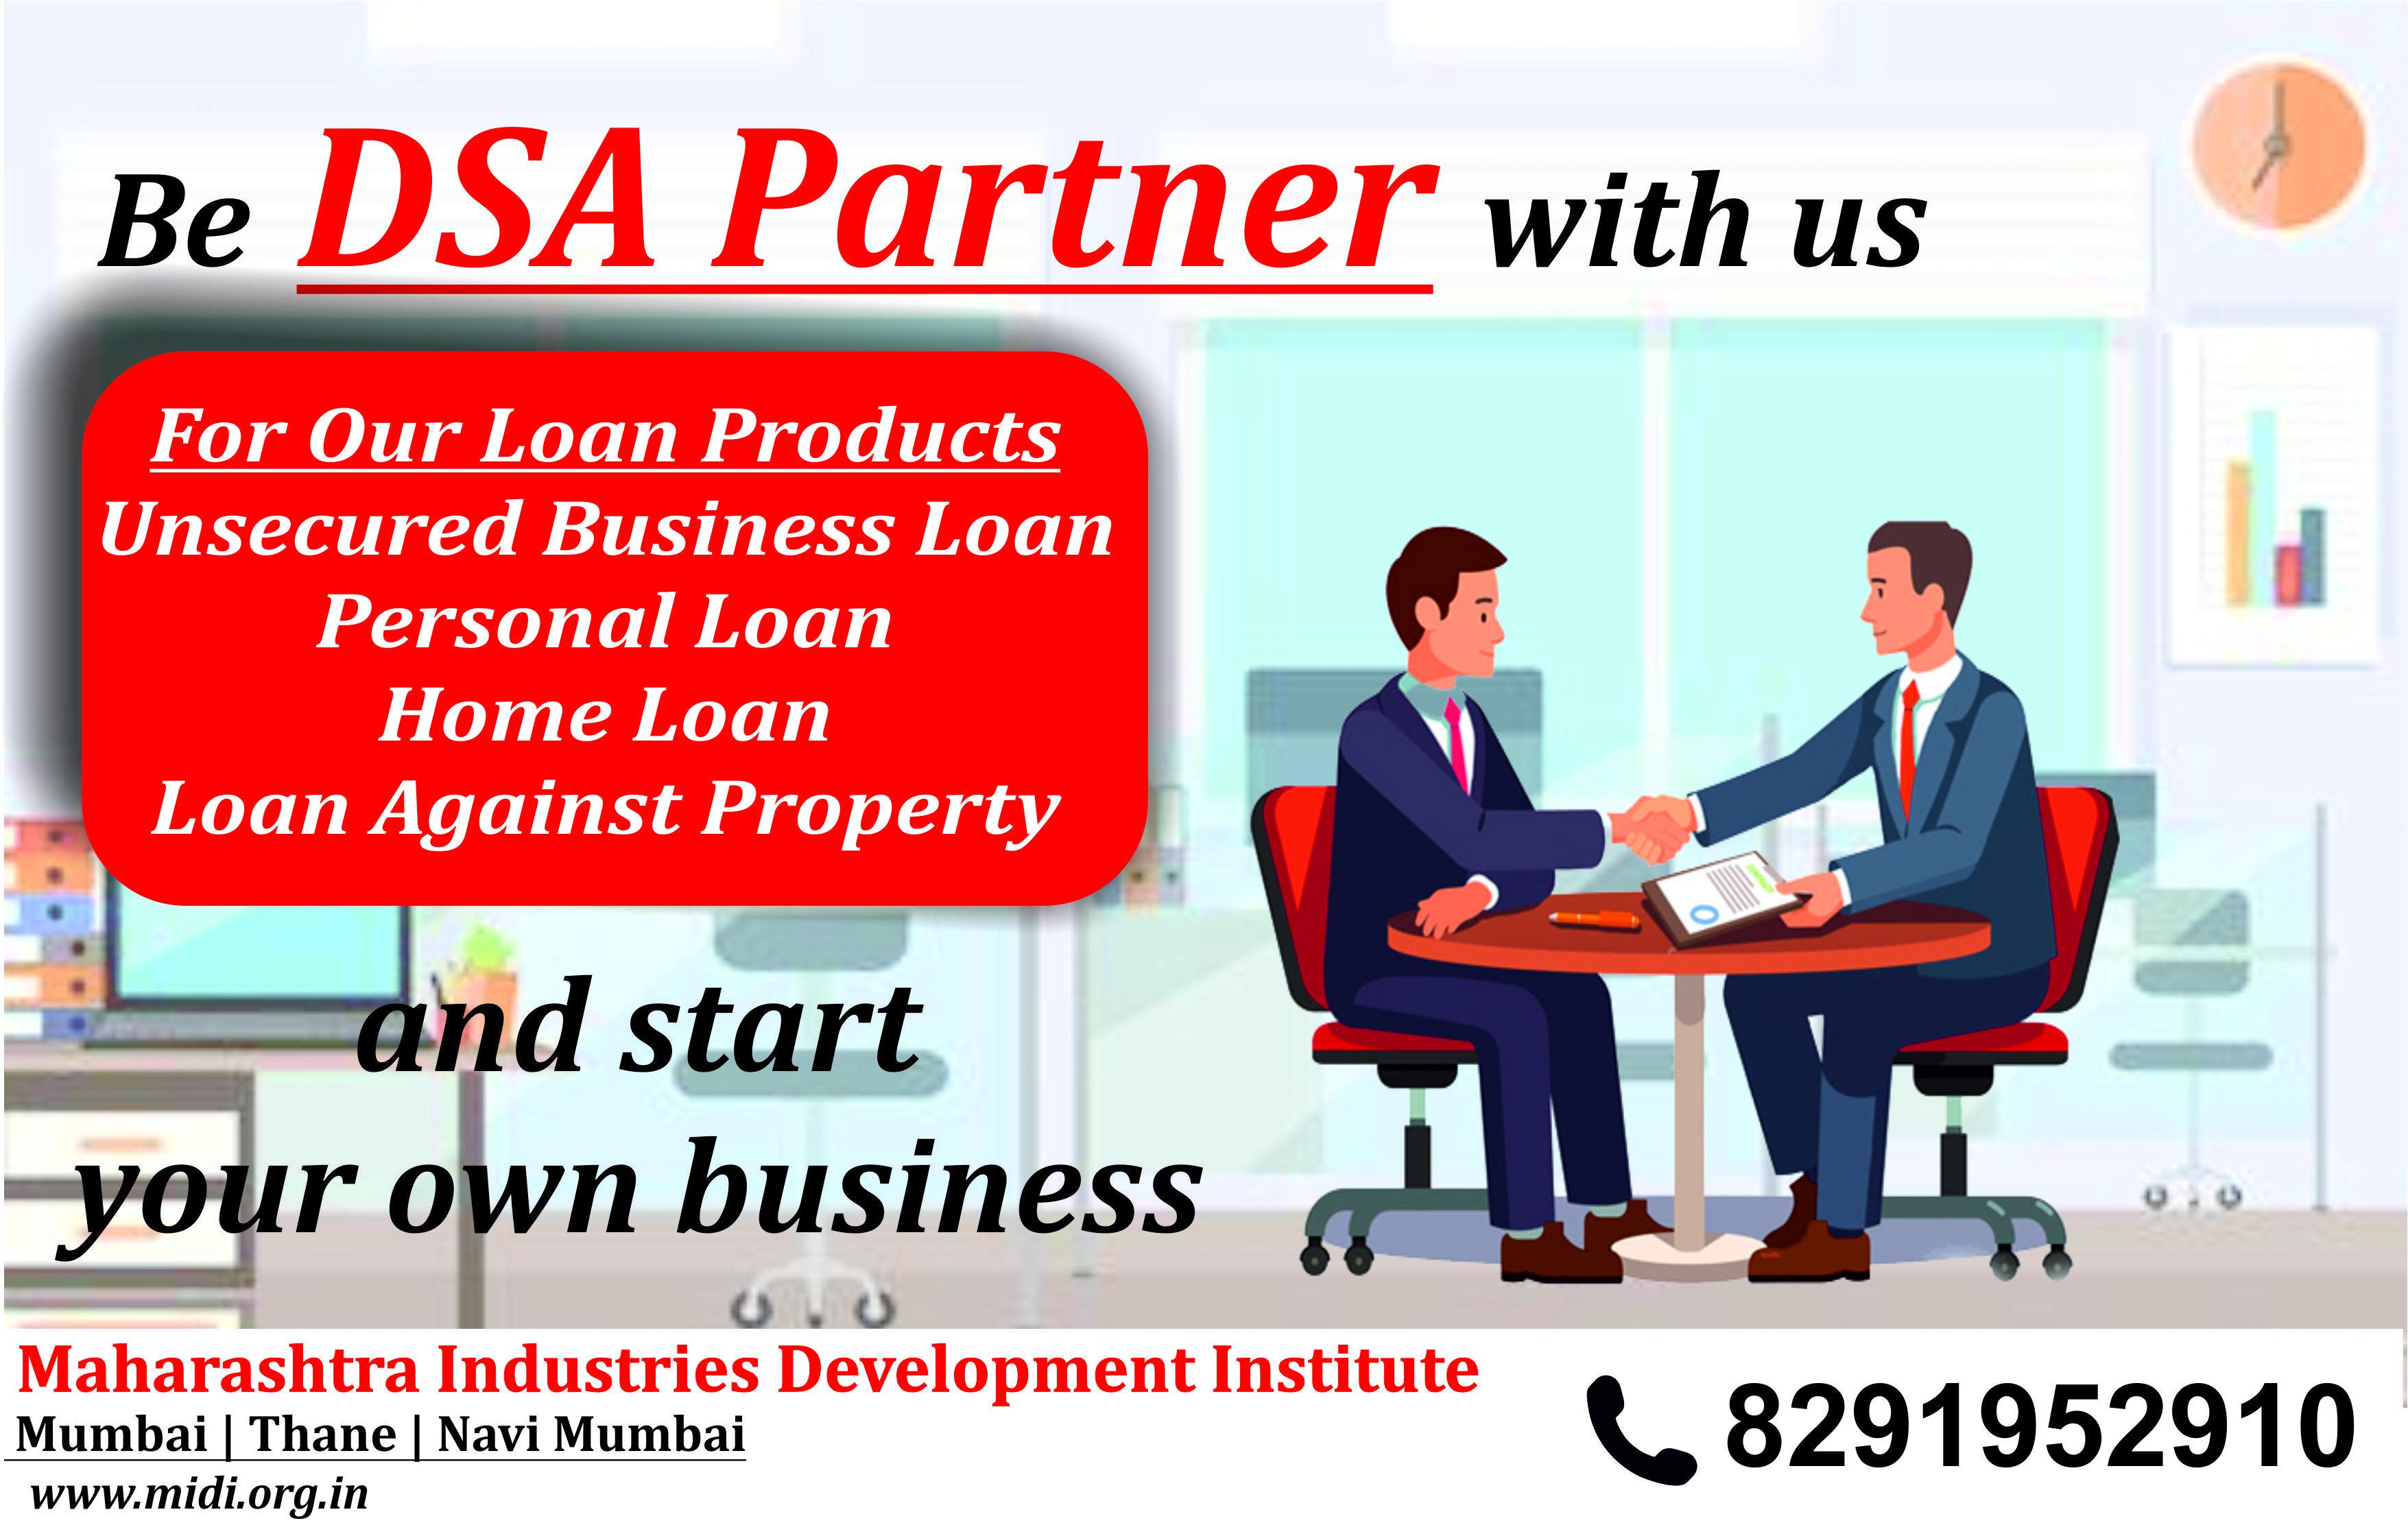 Dsa Partner Start Online Business Starting Your Own Business Personal Loans